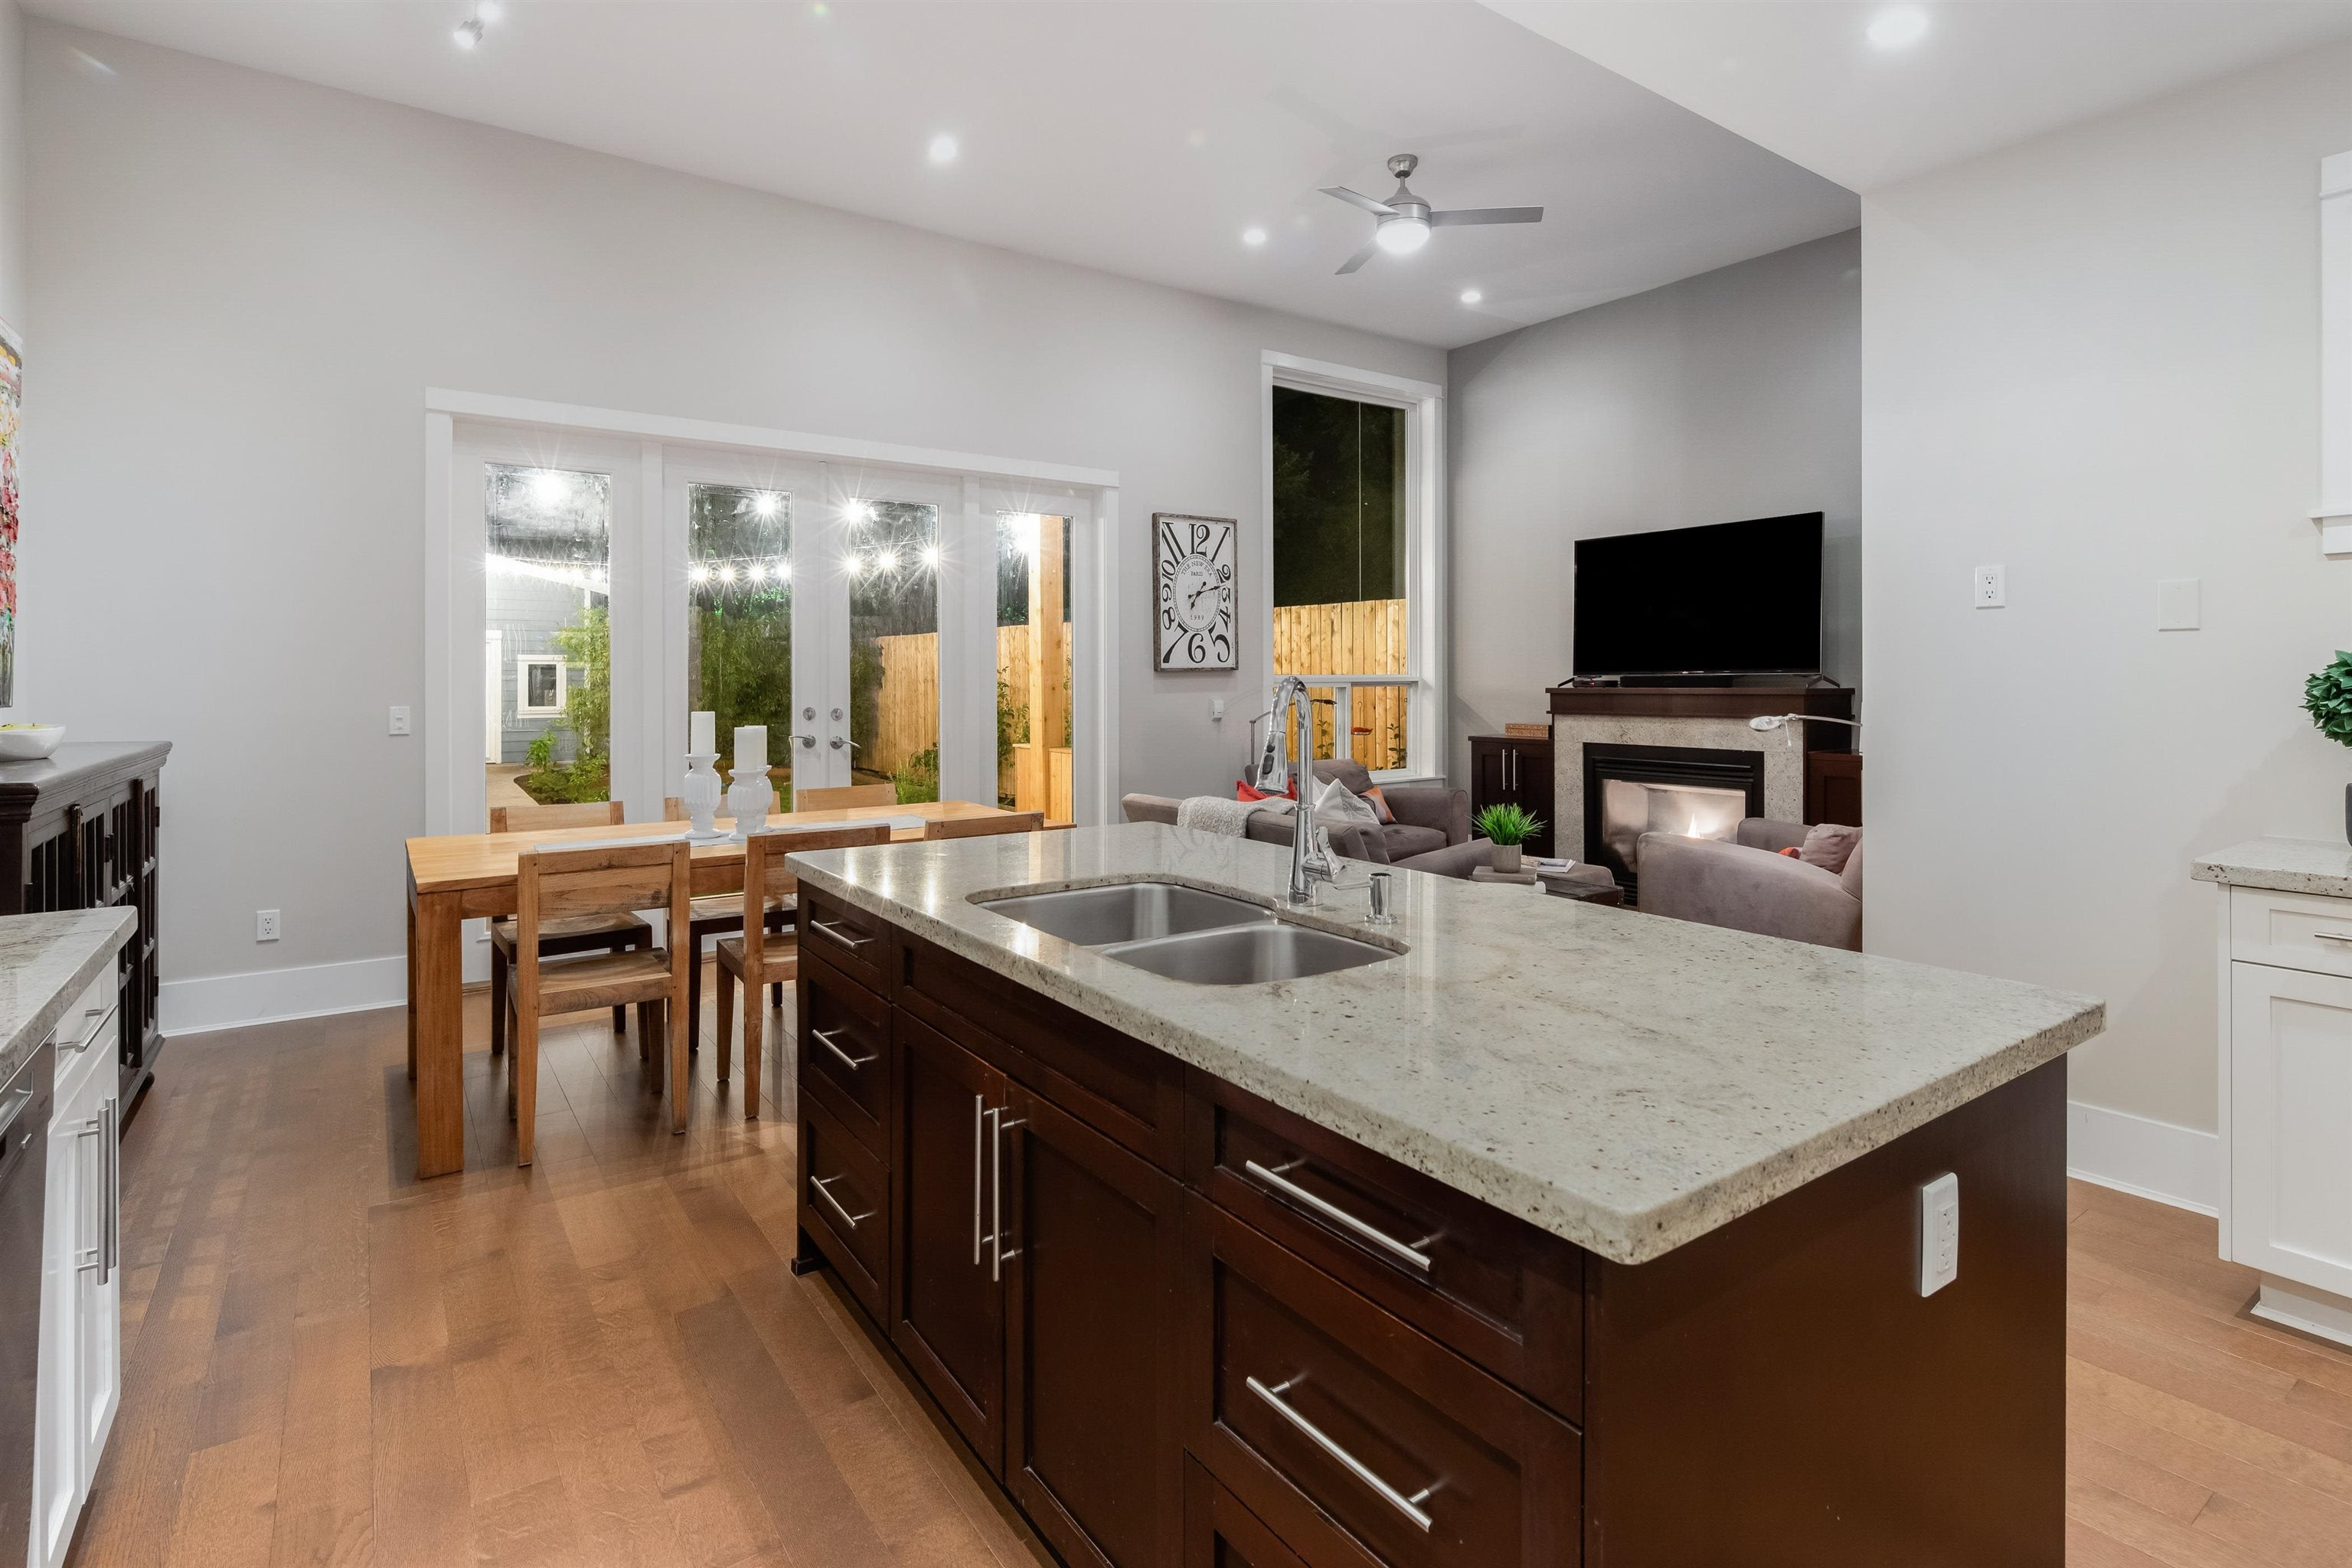 2258 WINDRIDGE DRIVE - Seymour NV House/Single Family for sale, 5 Bedrooms (R2617156) - #5